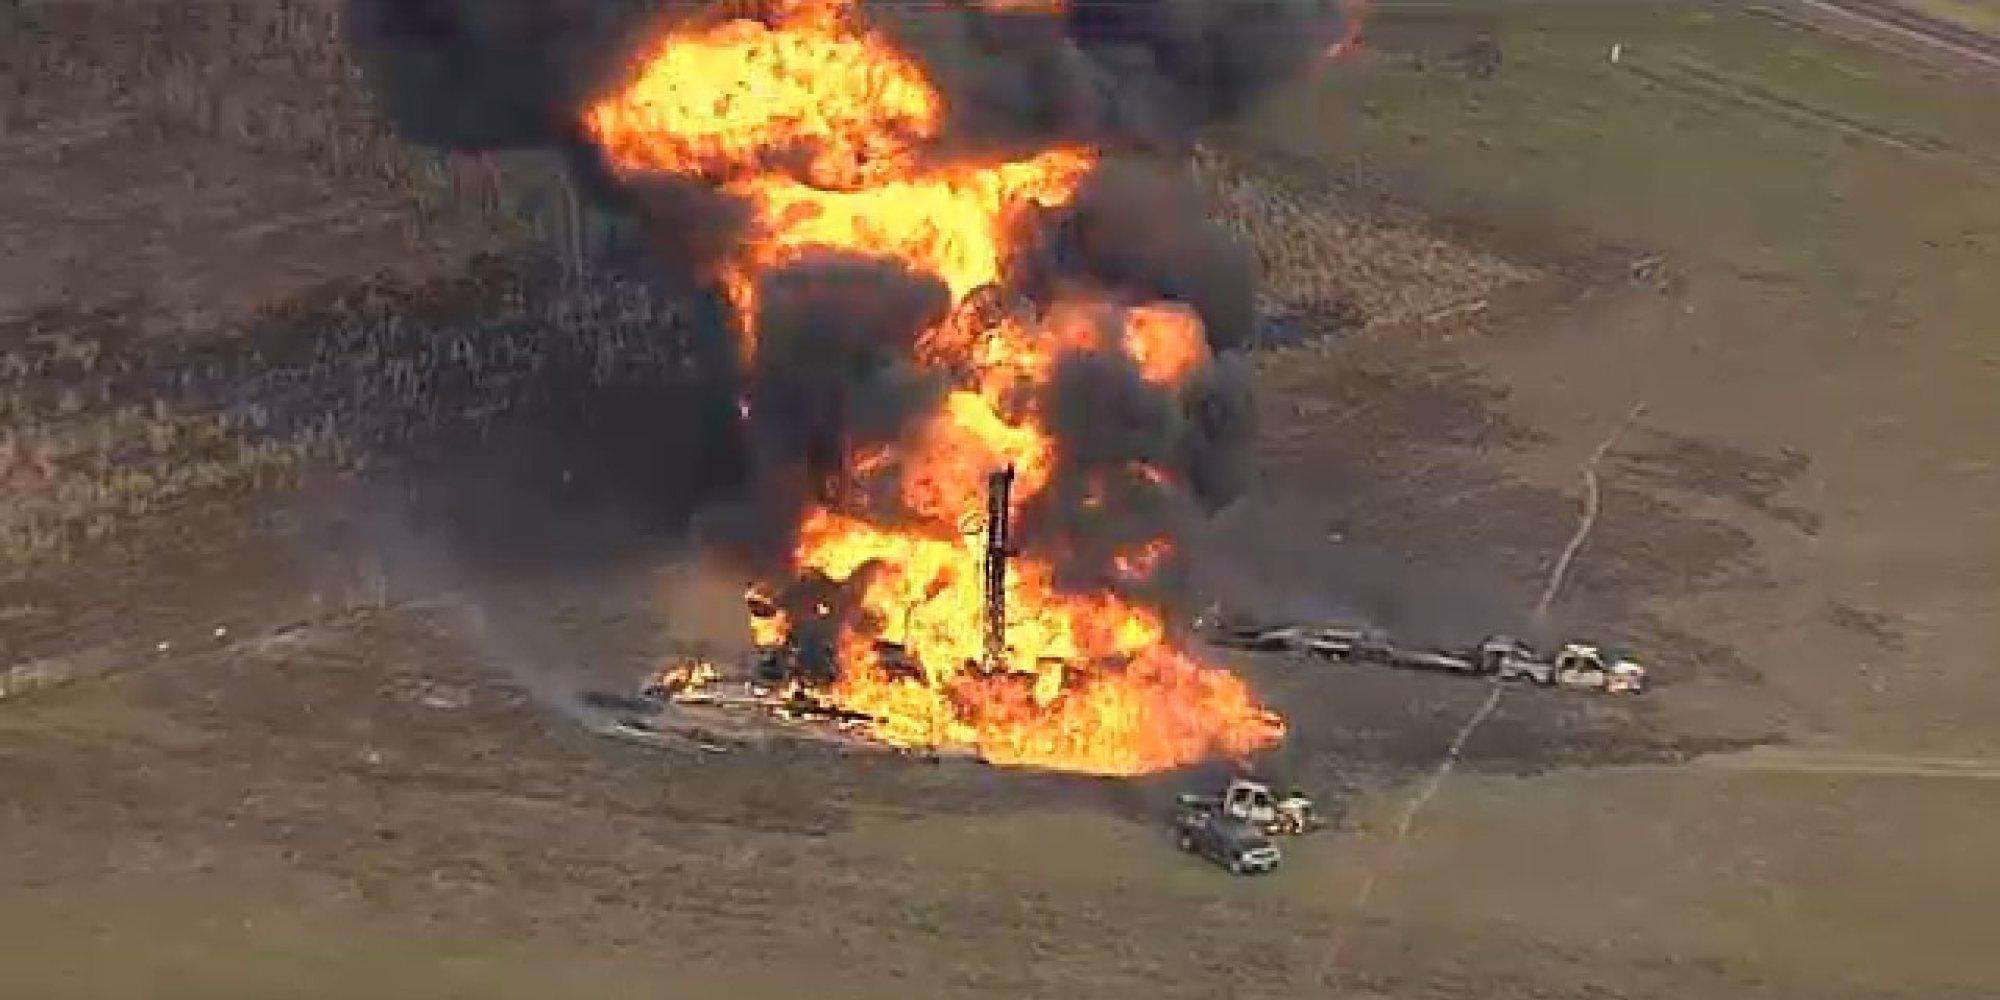 Texas Gas Pipeline Fire Near Milford Sends Flames Shooting